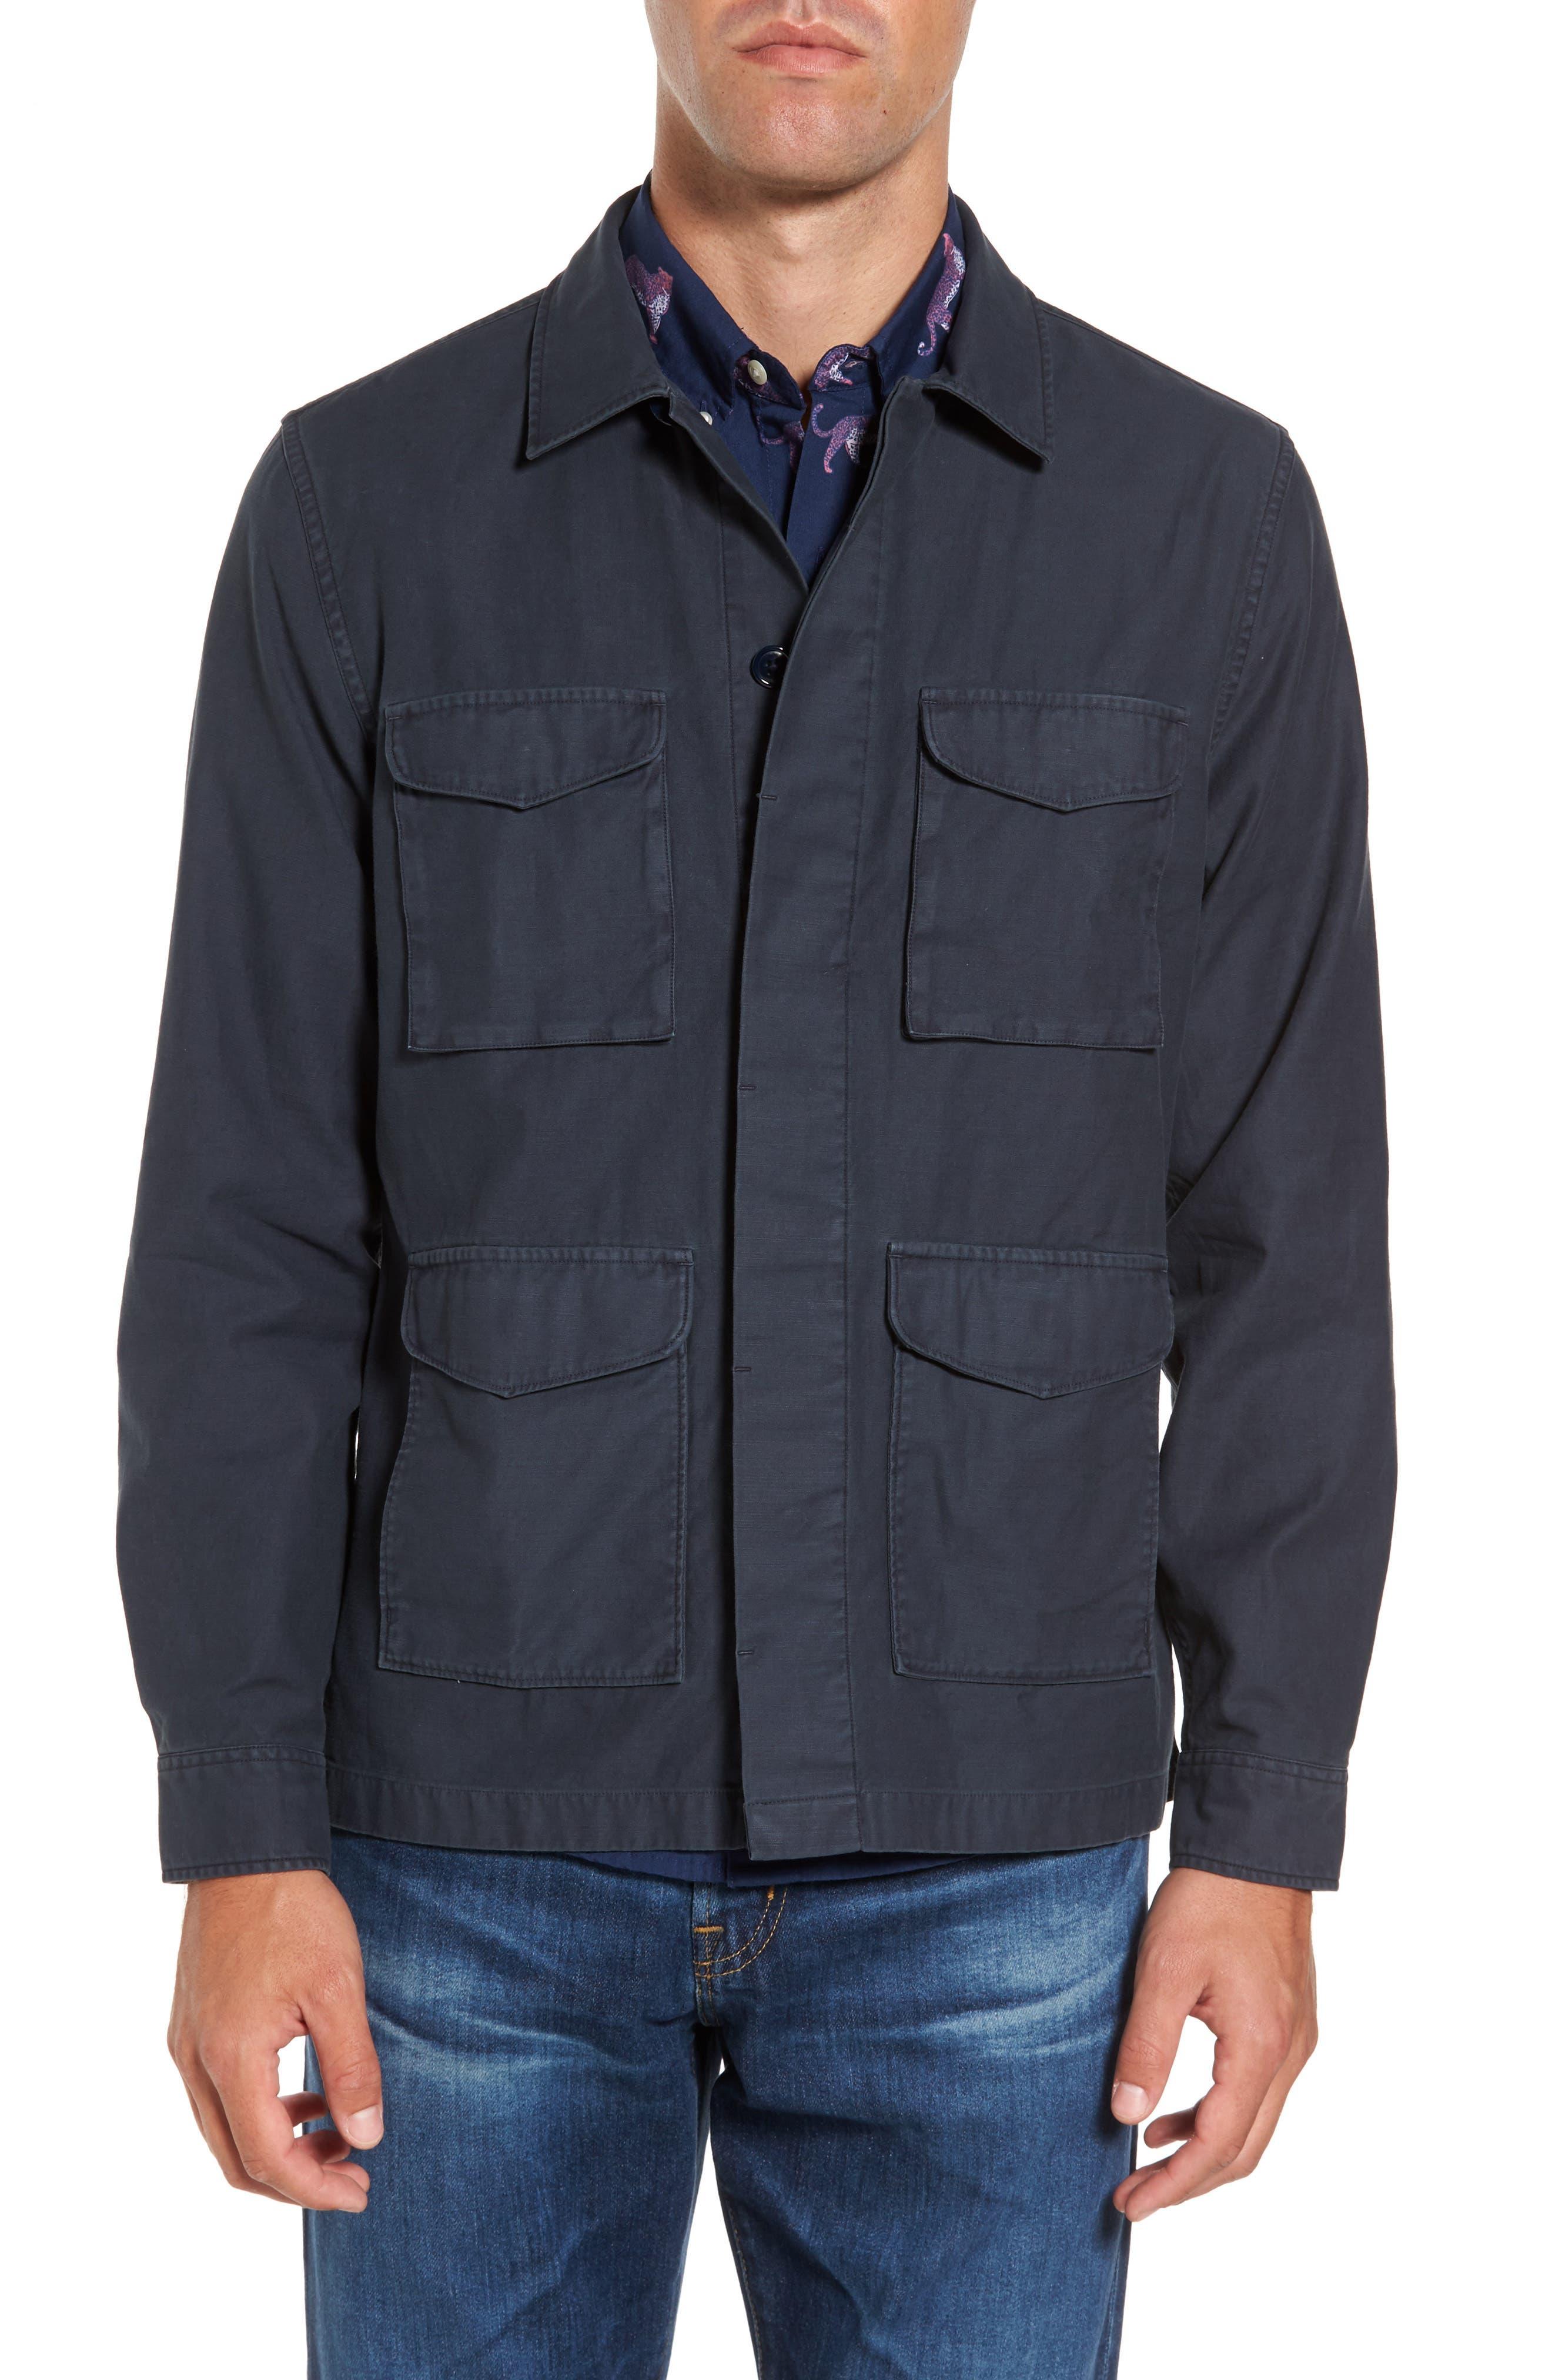 Men's Vintage Workwear – 1920s, 1930s, 1940s, 1950s Mens Bonobos Four-Pocket Military Jacket Size X-Small - Blue $63.98 AT vintagedancer.com